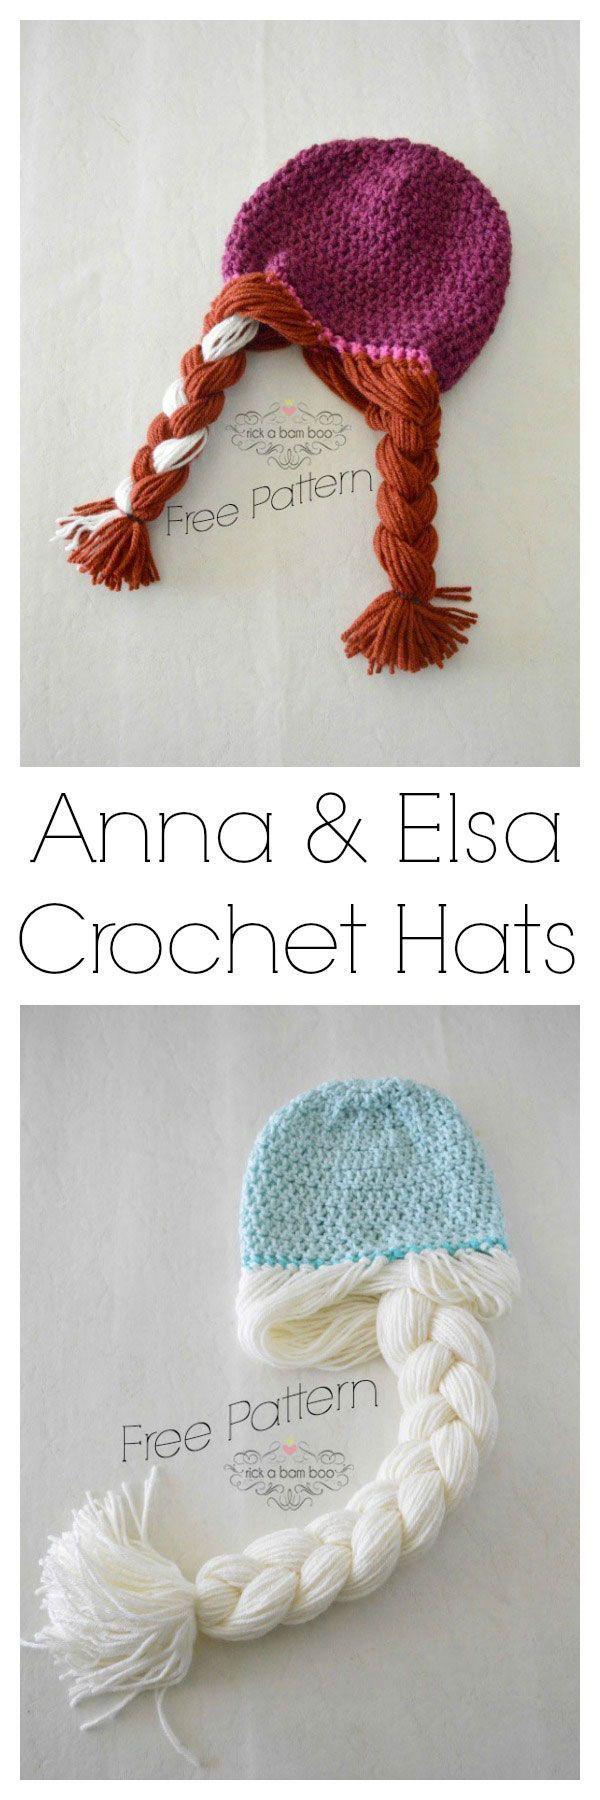 Mejores 100 imágenes de crochet items en Pinterest | Patrones de ...